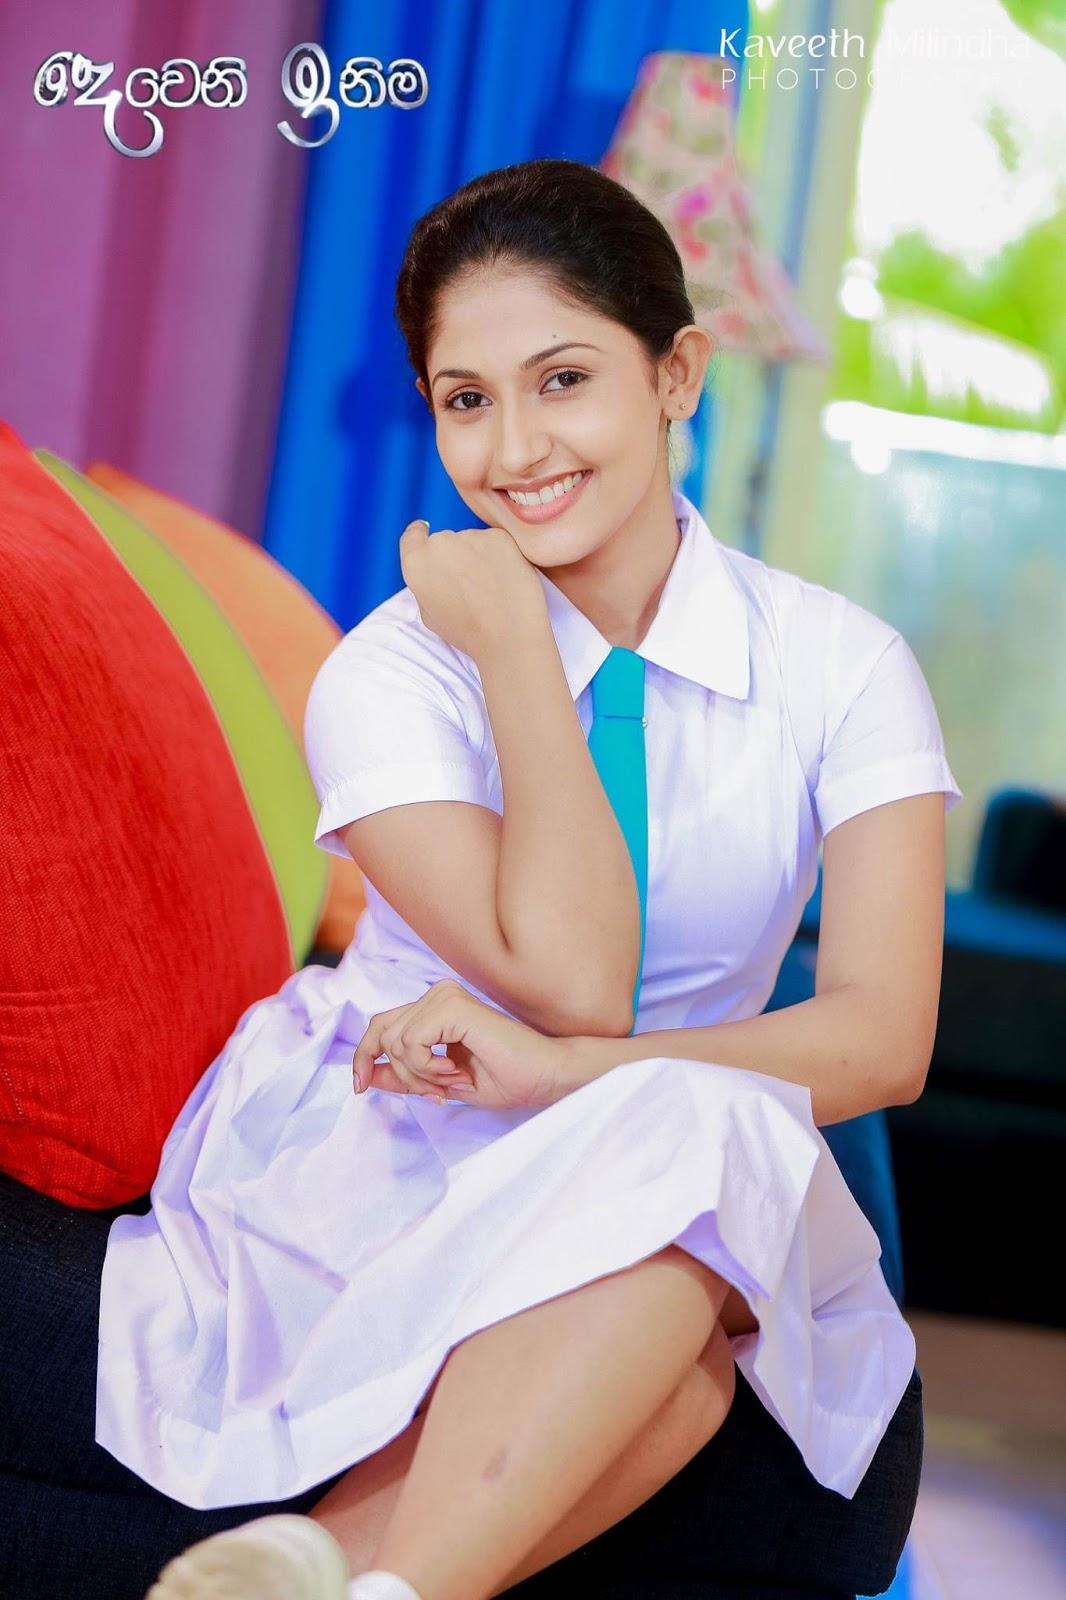 Nayanathara Wickramarachchi Is A Sri Lankan Tele Drama Actress Her Most Popular Tele Drama Is Deweni Inima Who Telecast By Tv Derana